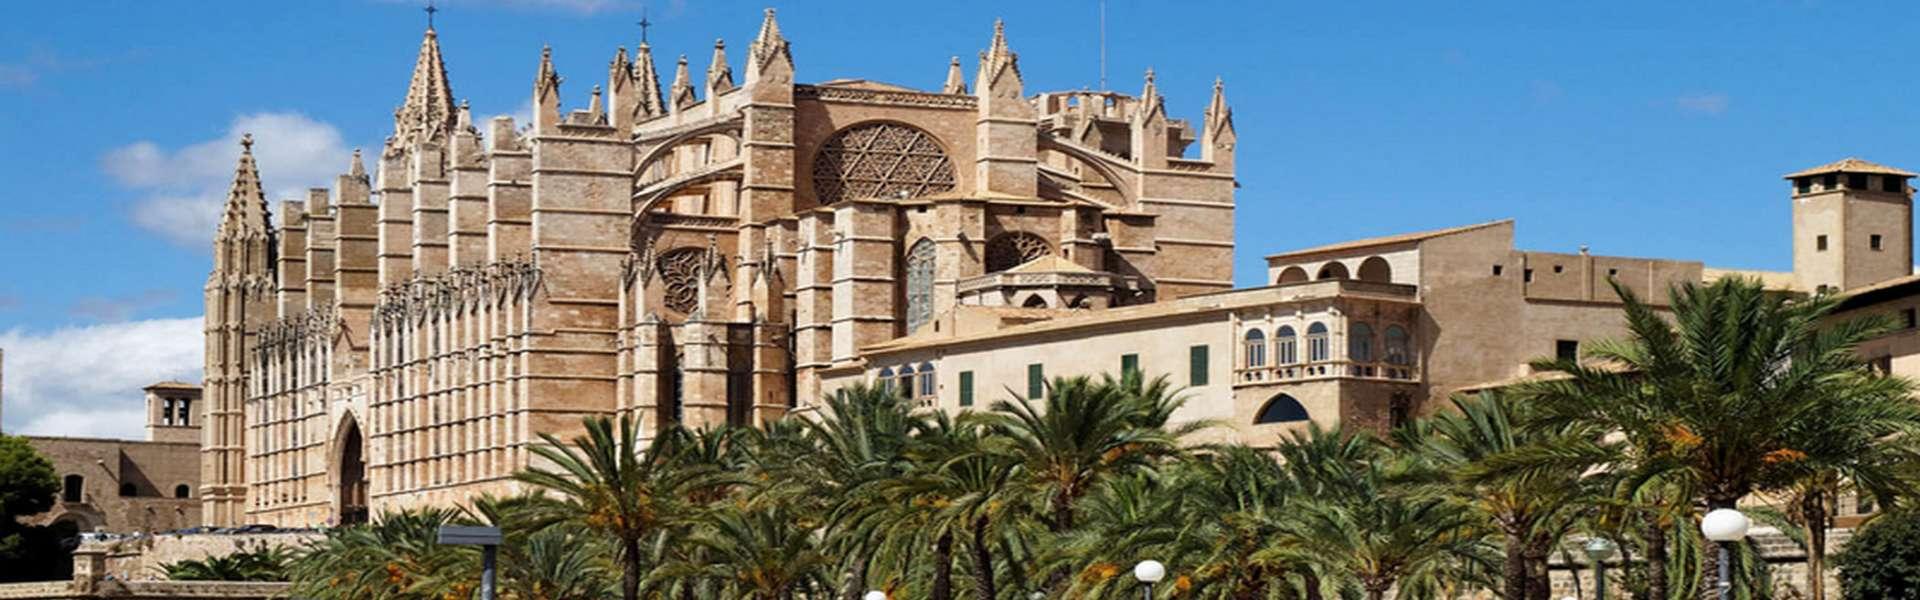 Palma/Zentrum – Exklusives Design-Apartment nahe Kathedrale